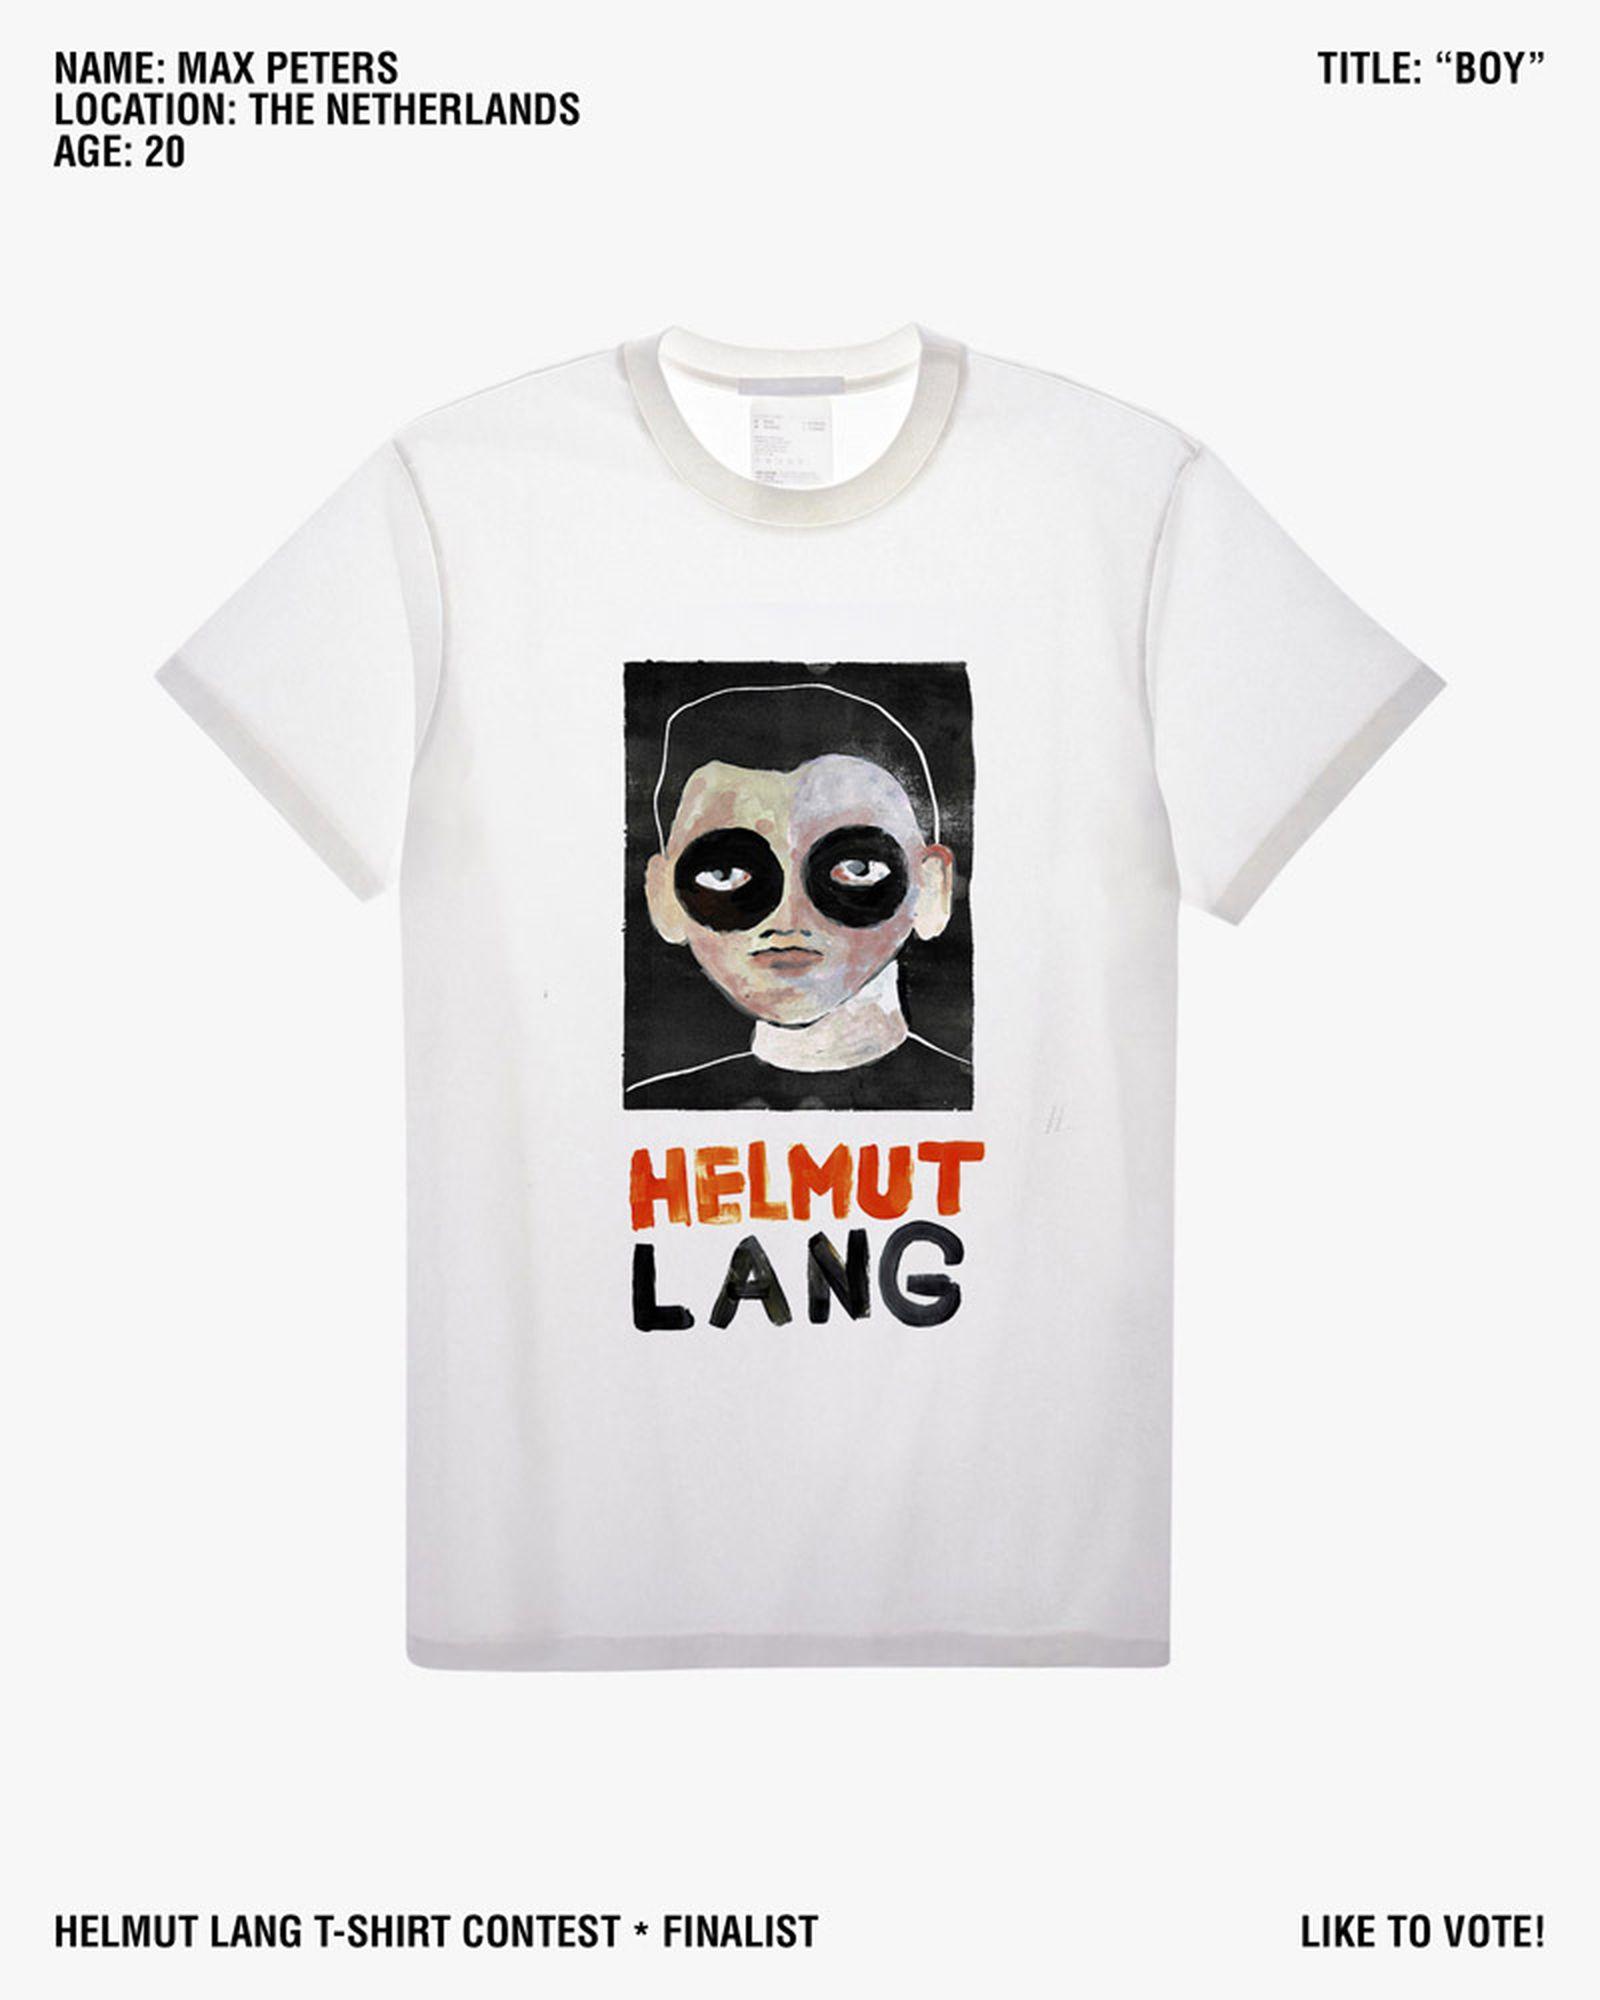 27helmut-lang-t-shirt-design-competition